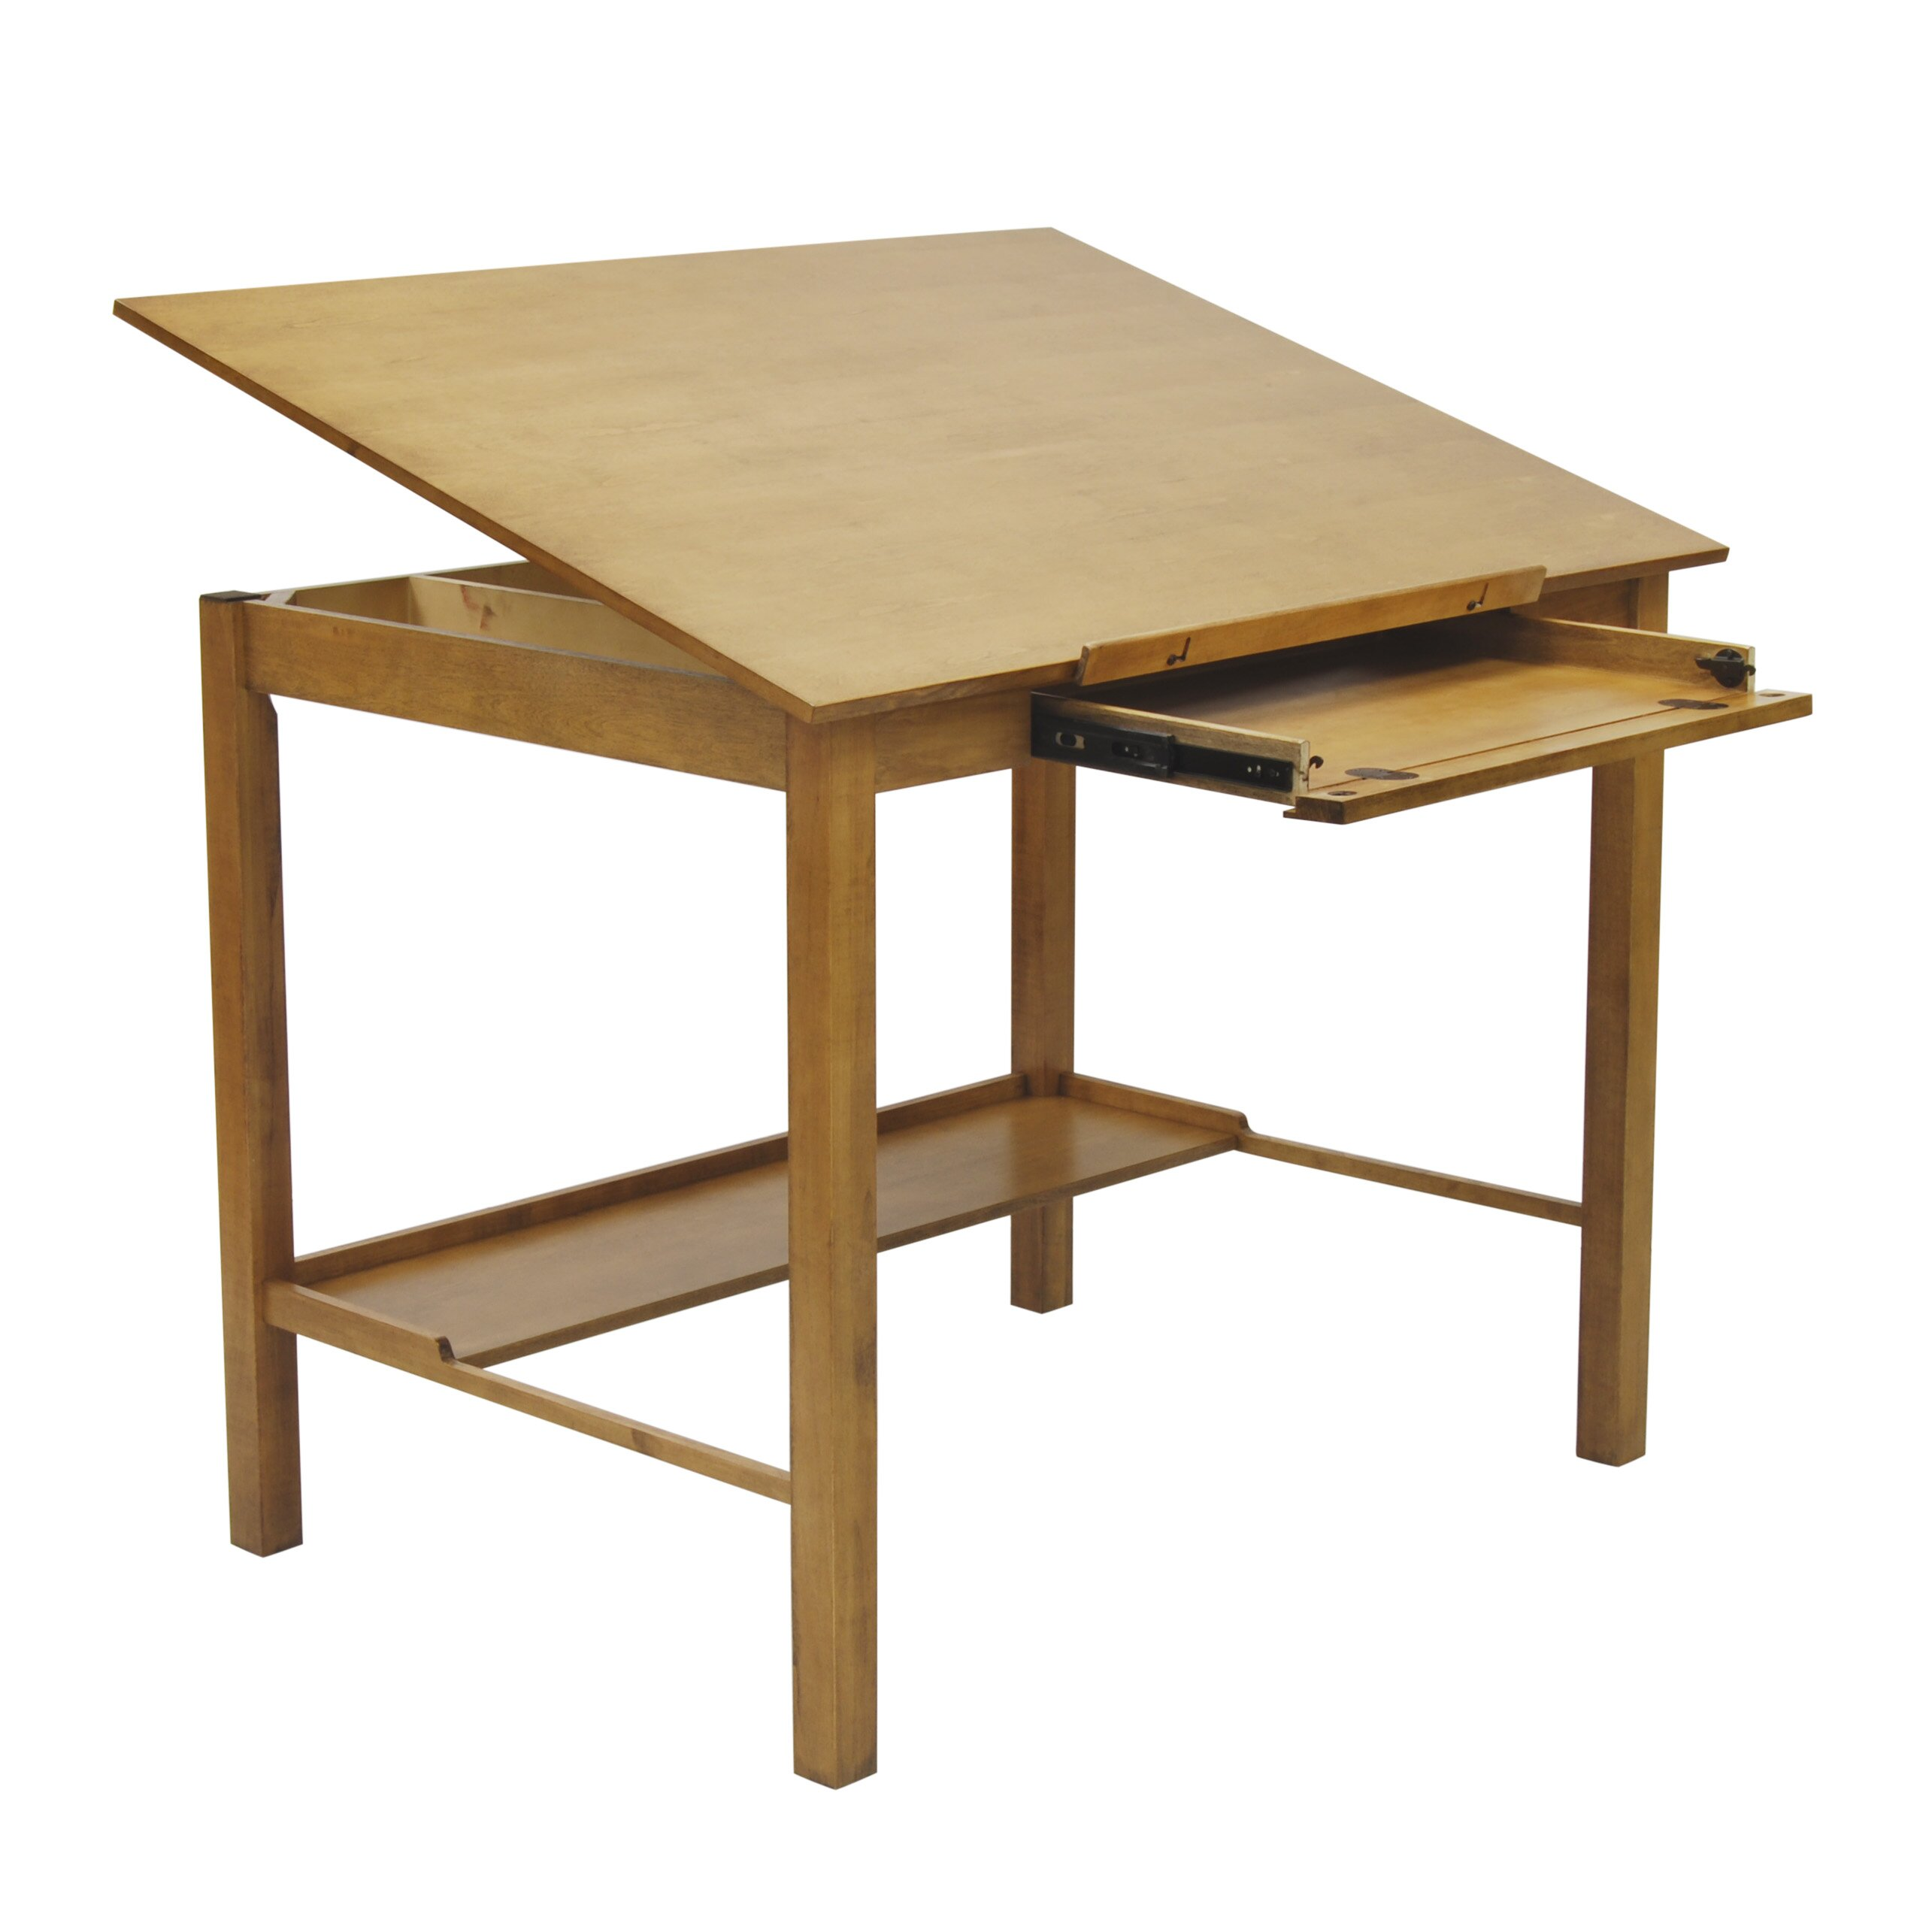 Studio designs americana drafting table reviews wayfair - Drafting table designs ...